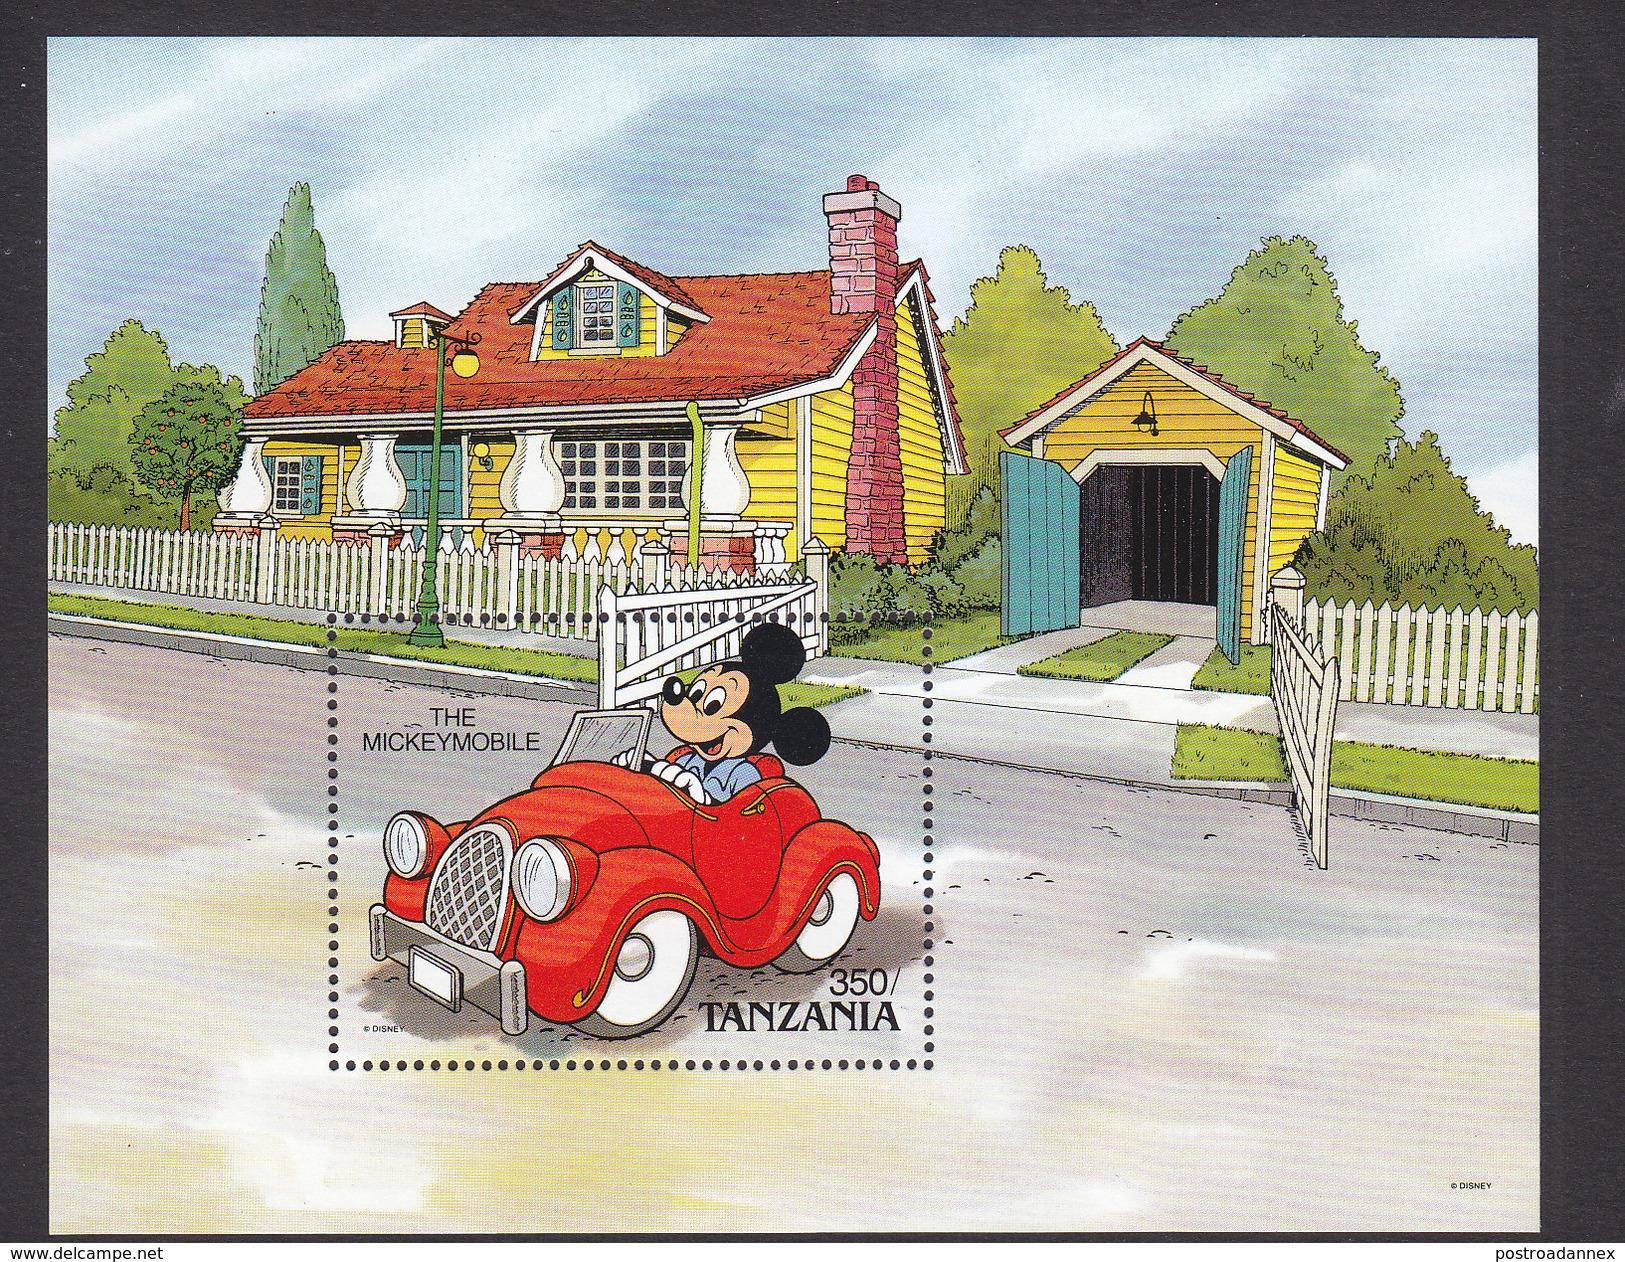 Tanzania, Scott #579, Mint Never Hinged, Disney, Issued 1990 - Tanzania (1964-...)